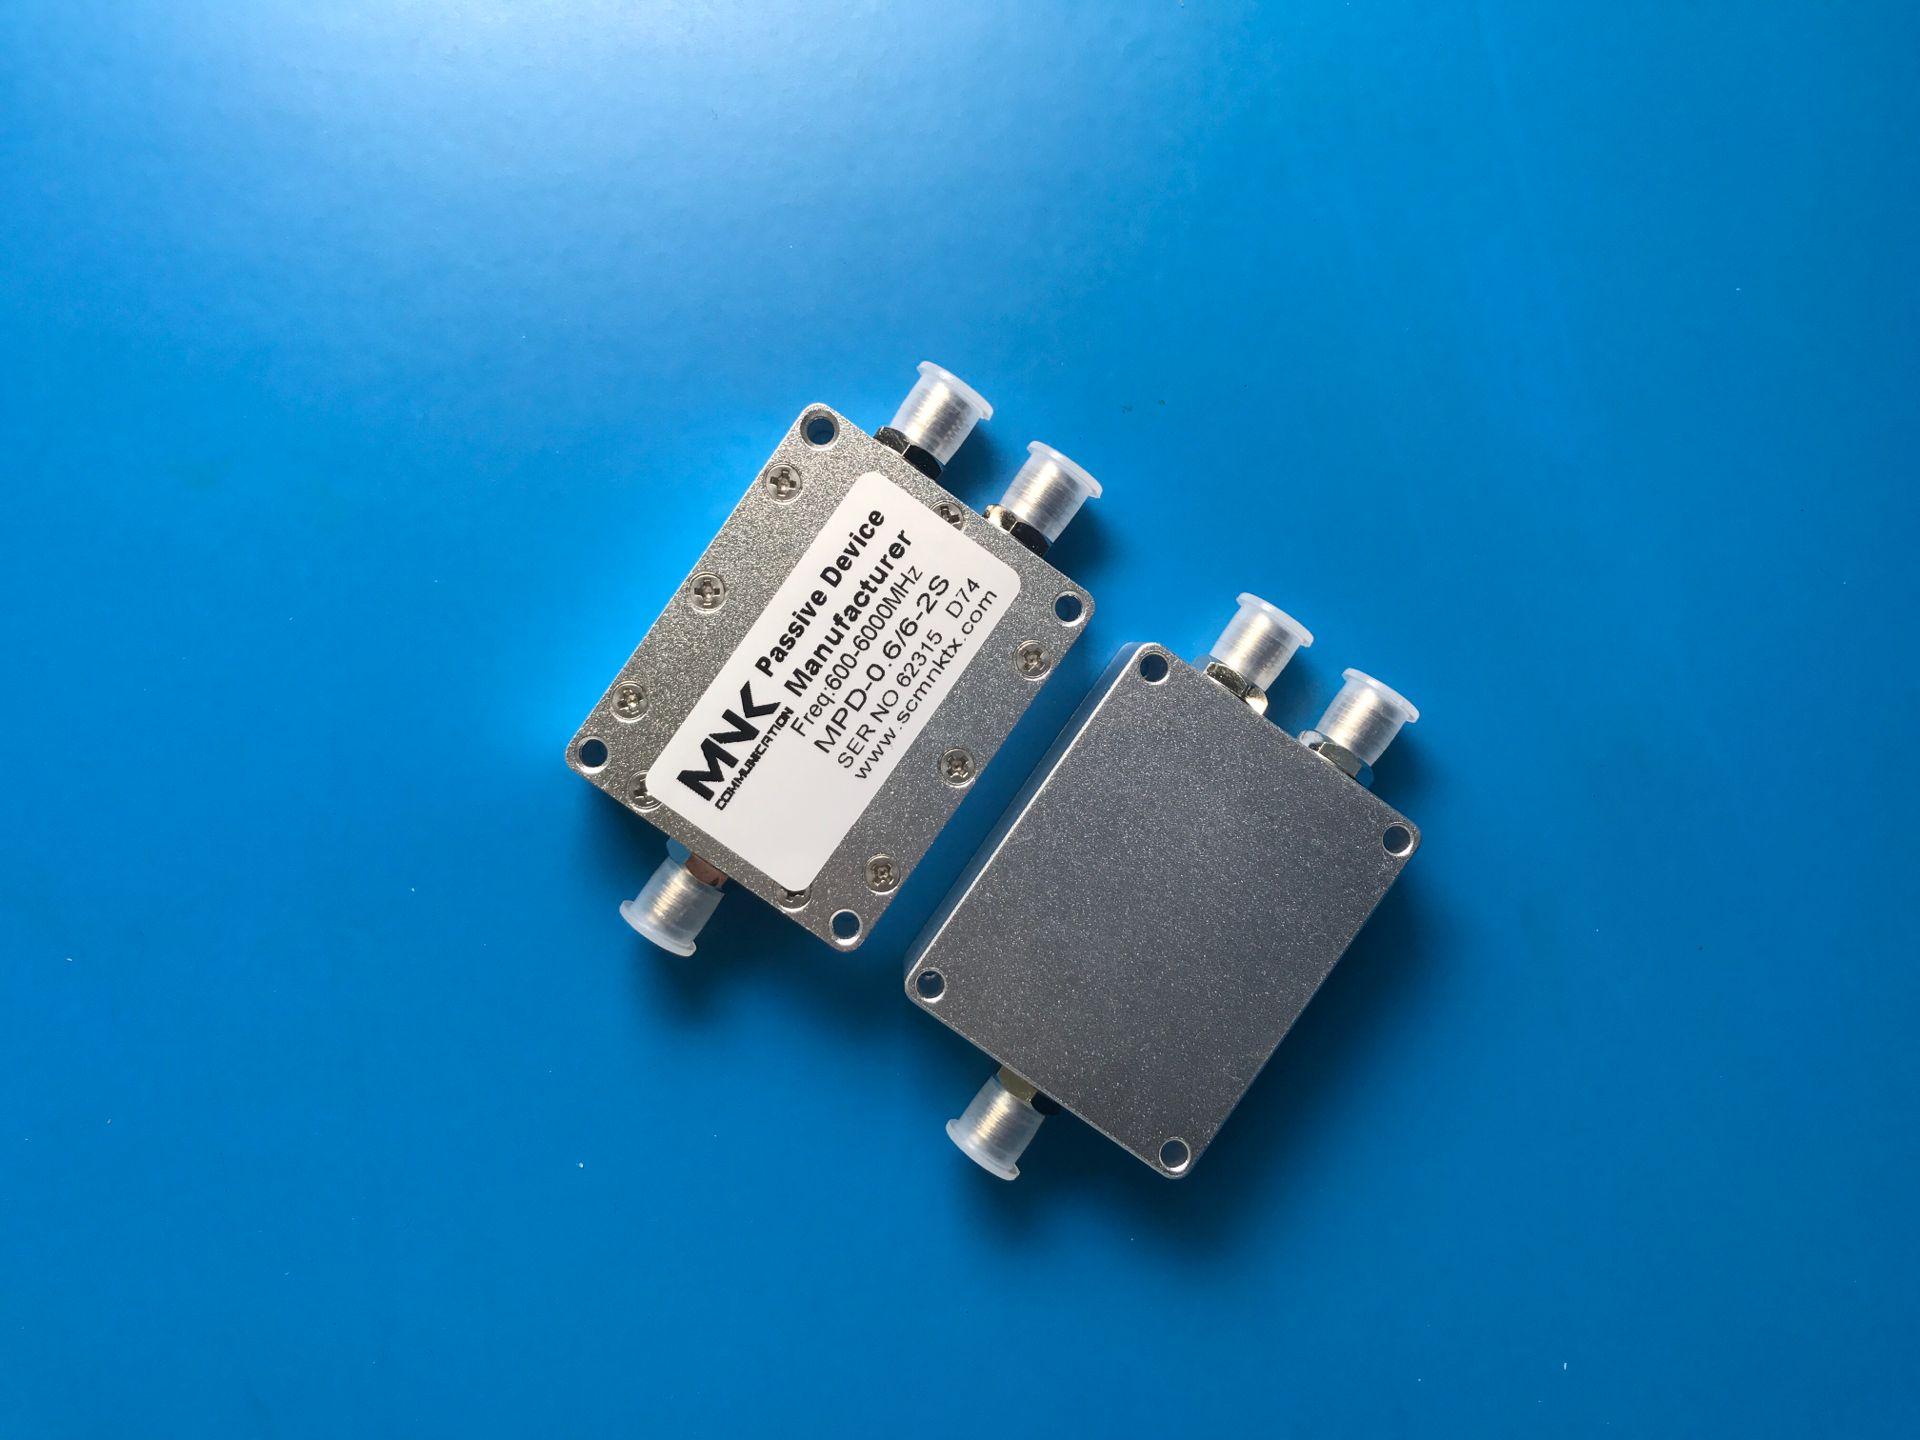 SMA600-6000M Microstrip Divider GPS/WIFI Divided Power Combiner 0.6-6G Divided Power Combiner